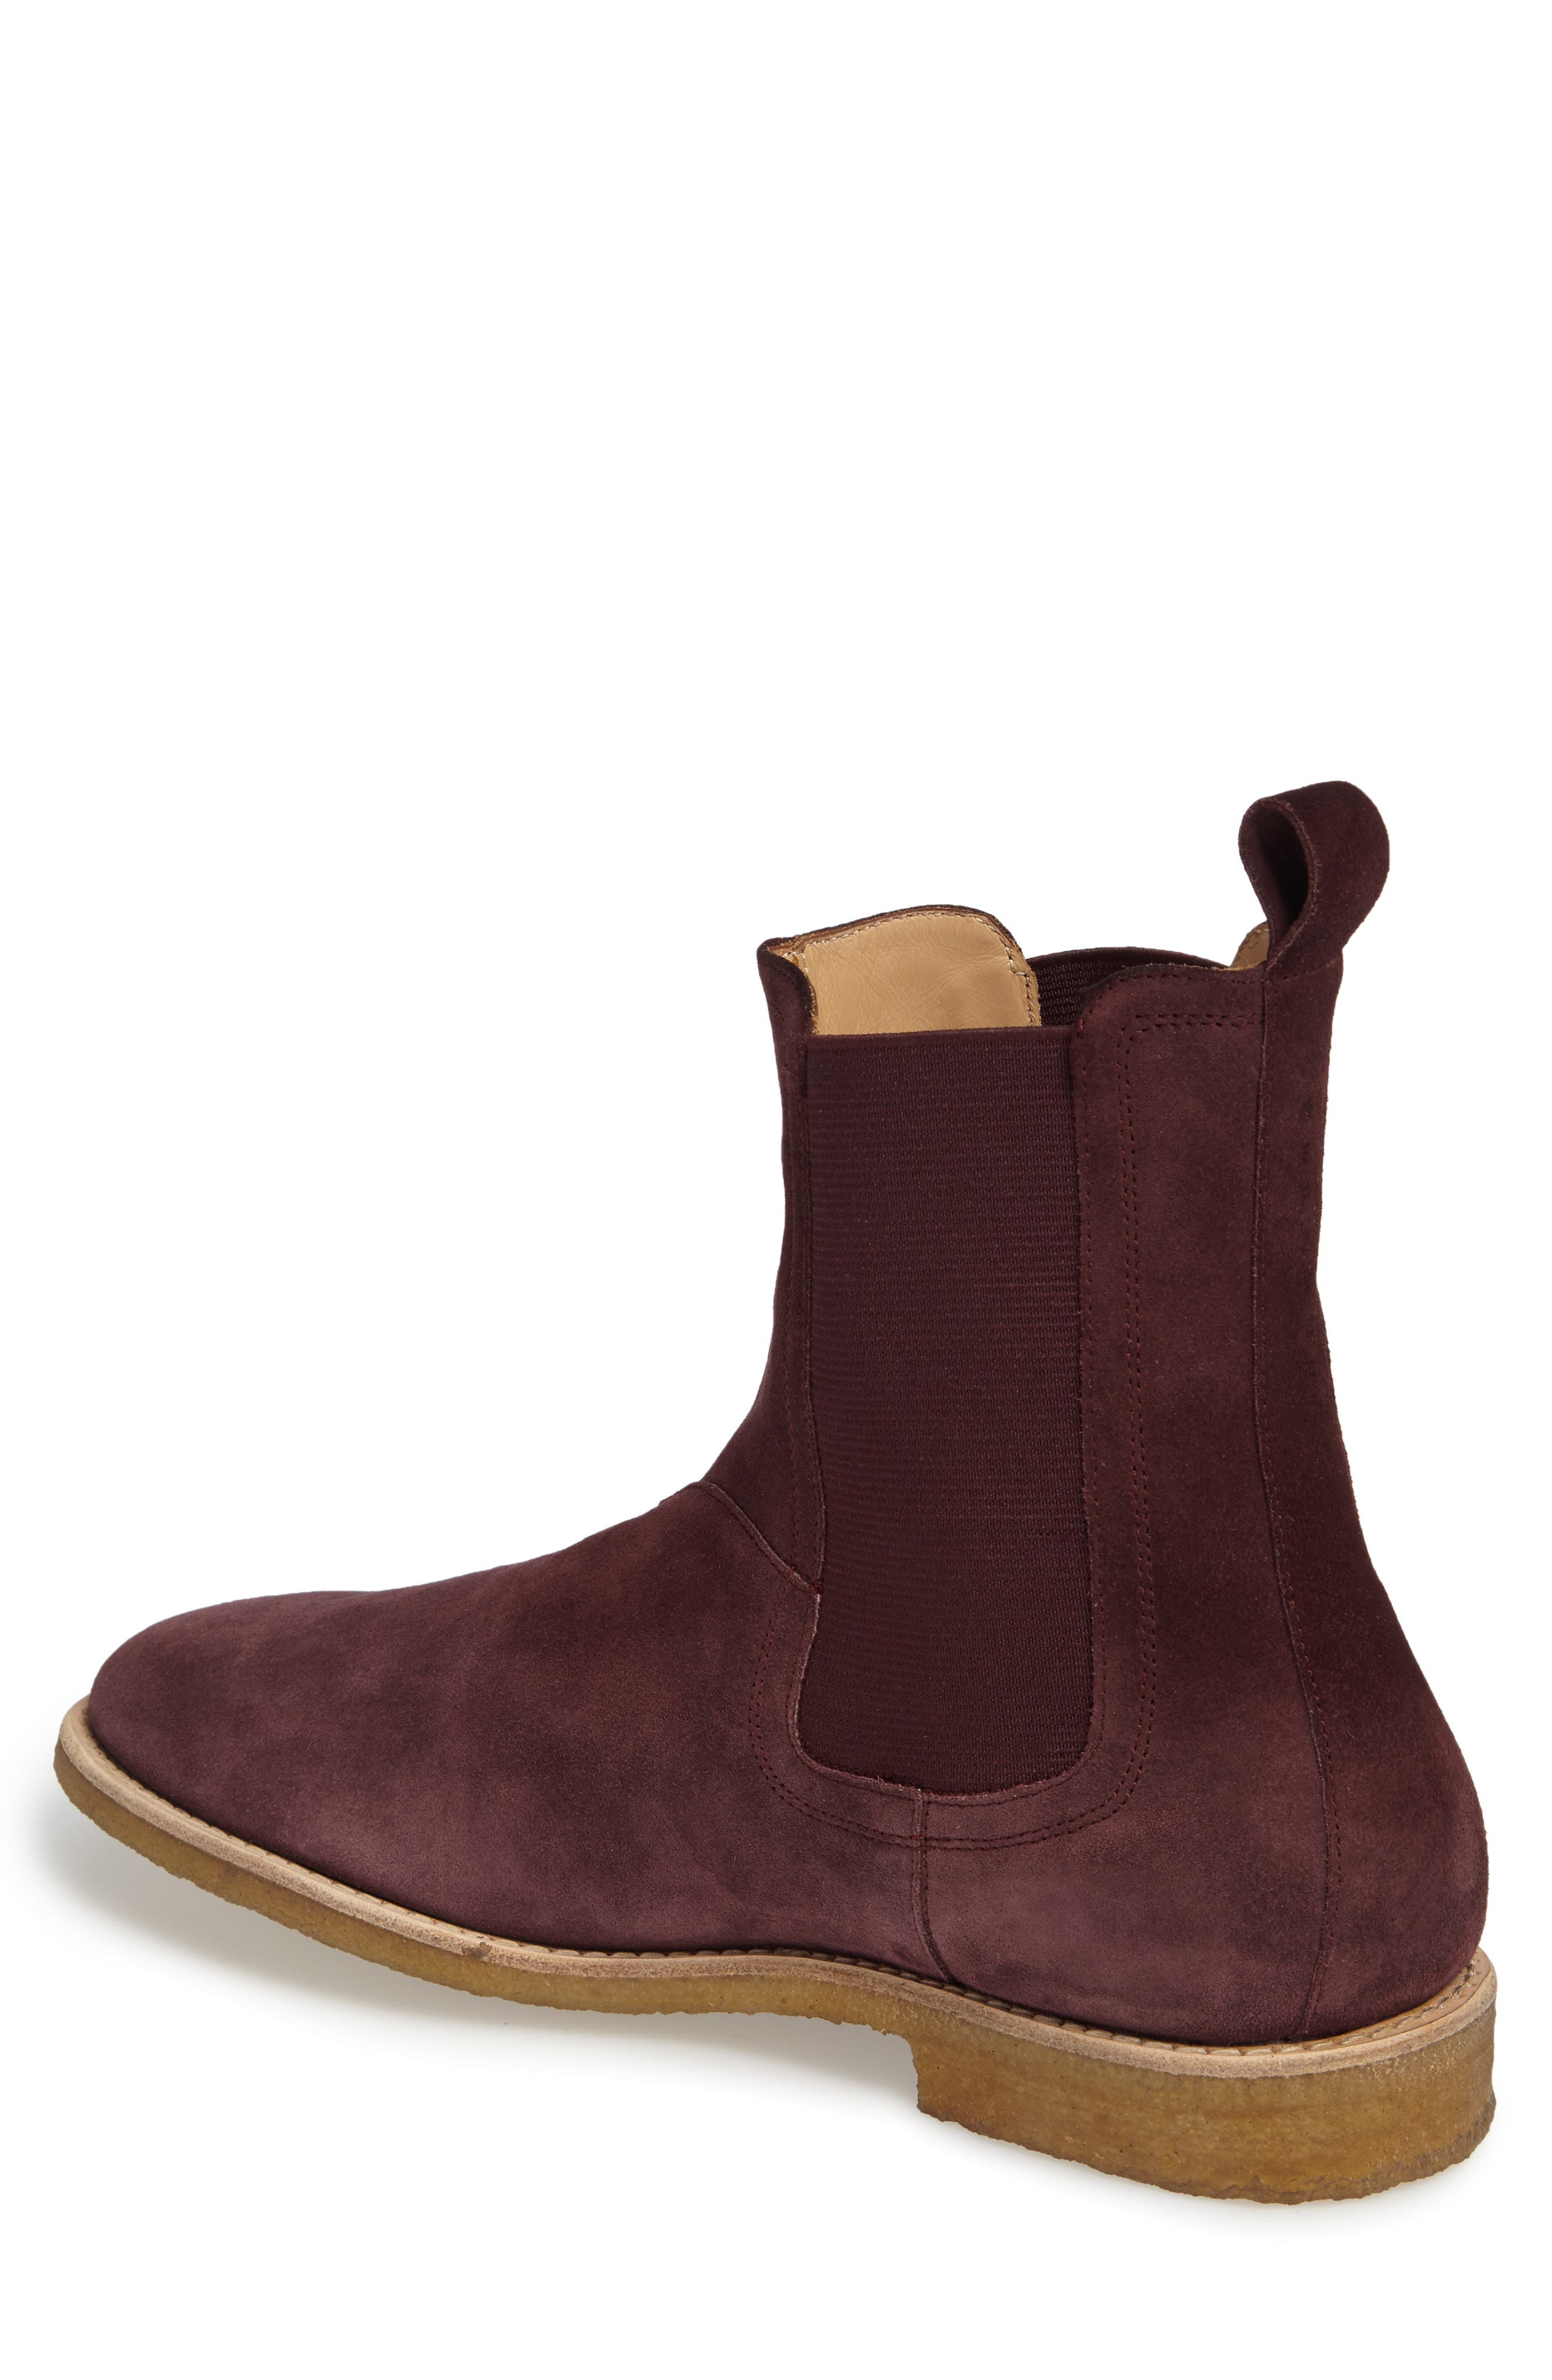 Chelsea Boot,                             Alternate thumbnail 3, color,                             Prunga Burgundy